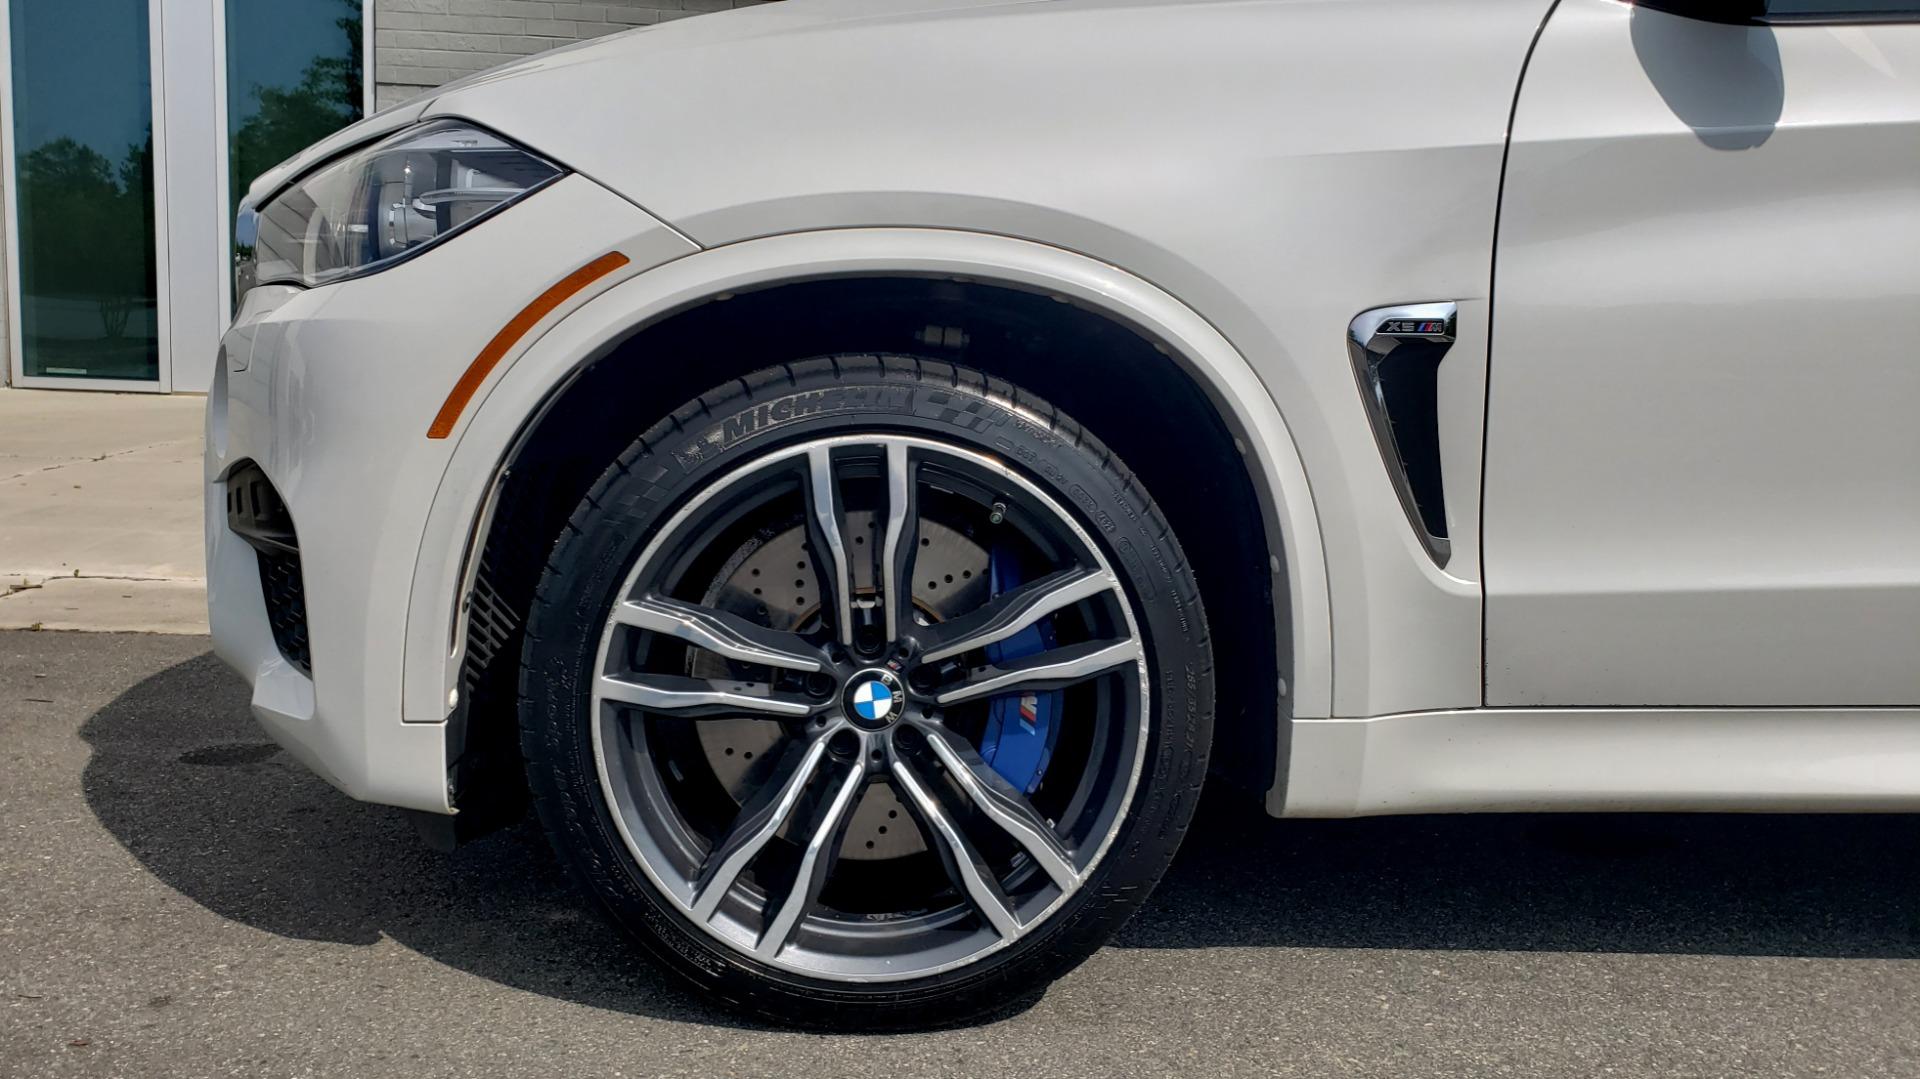 Used 2017 BMW X5 M EXECUTIVE PKG / NAV / DRVR ASST / BSM / HUD / HTD STS / WIFI for sale Sold at Formula Imports in Charlotte NC 28227 85